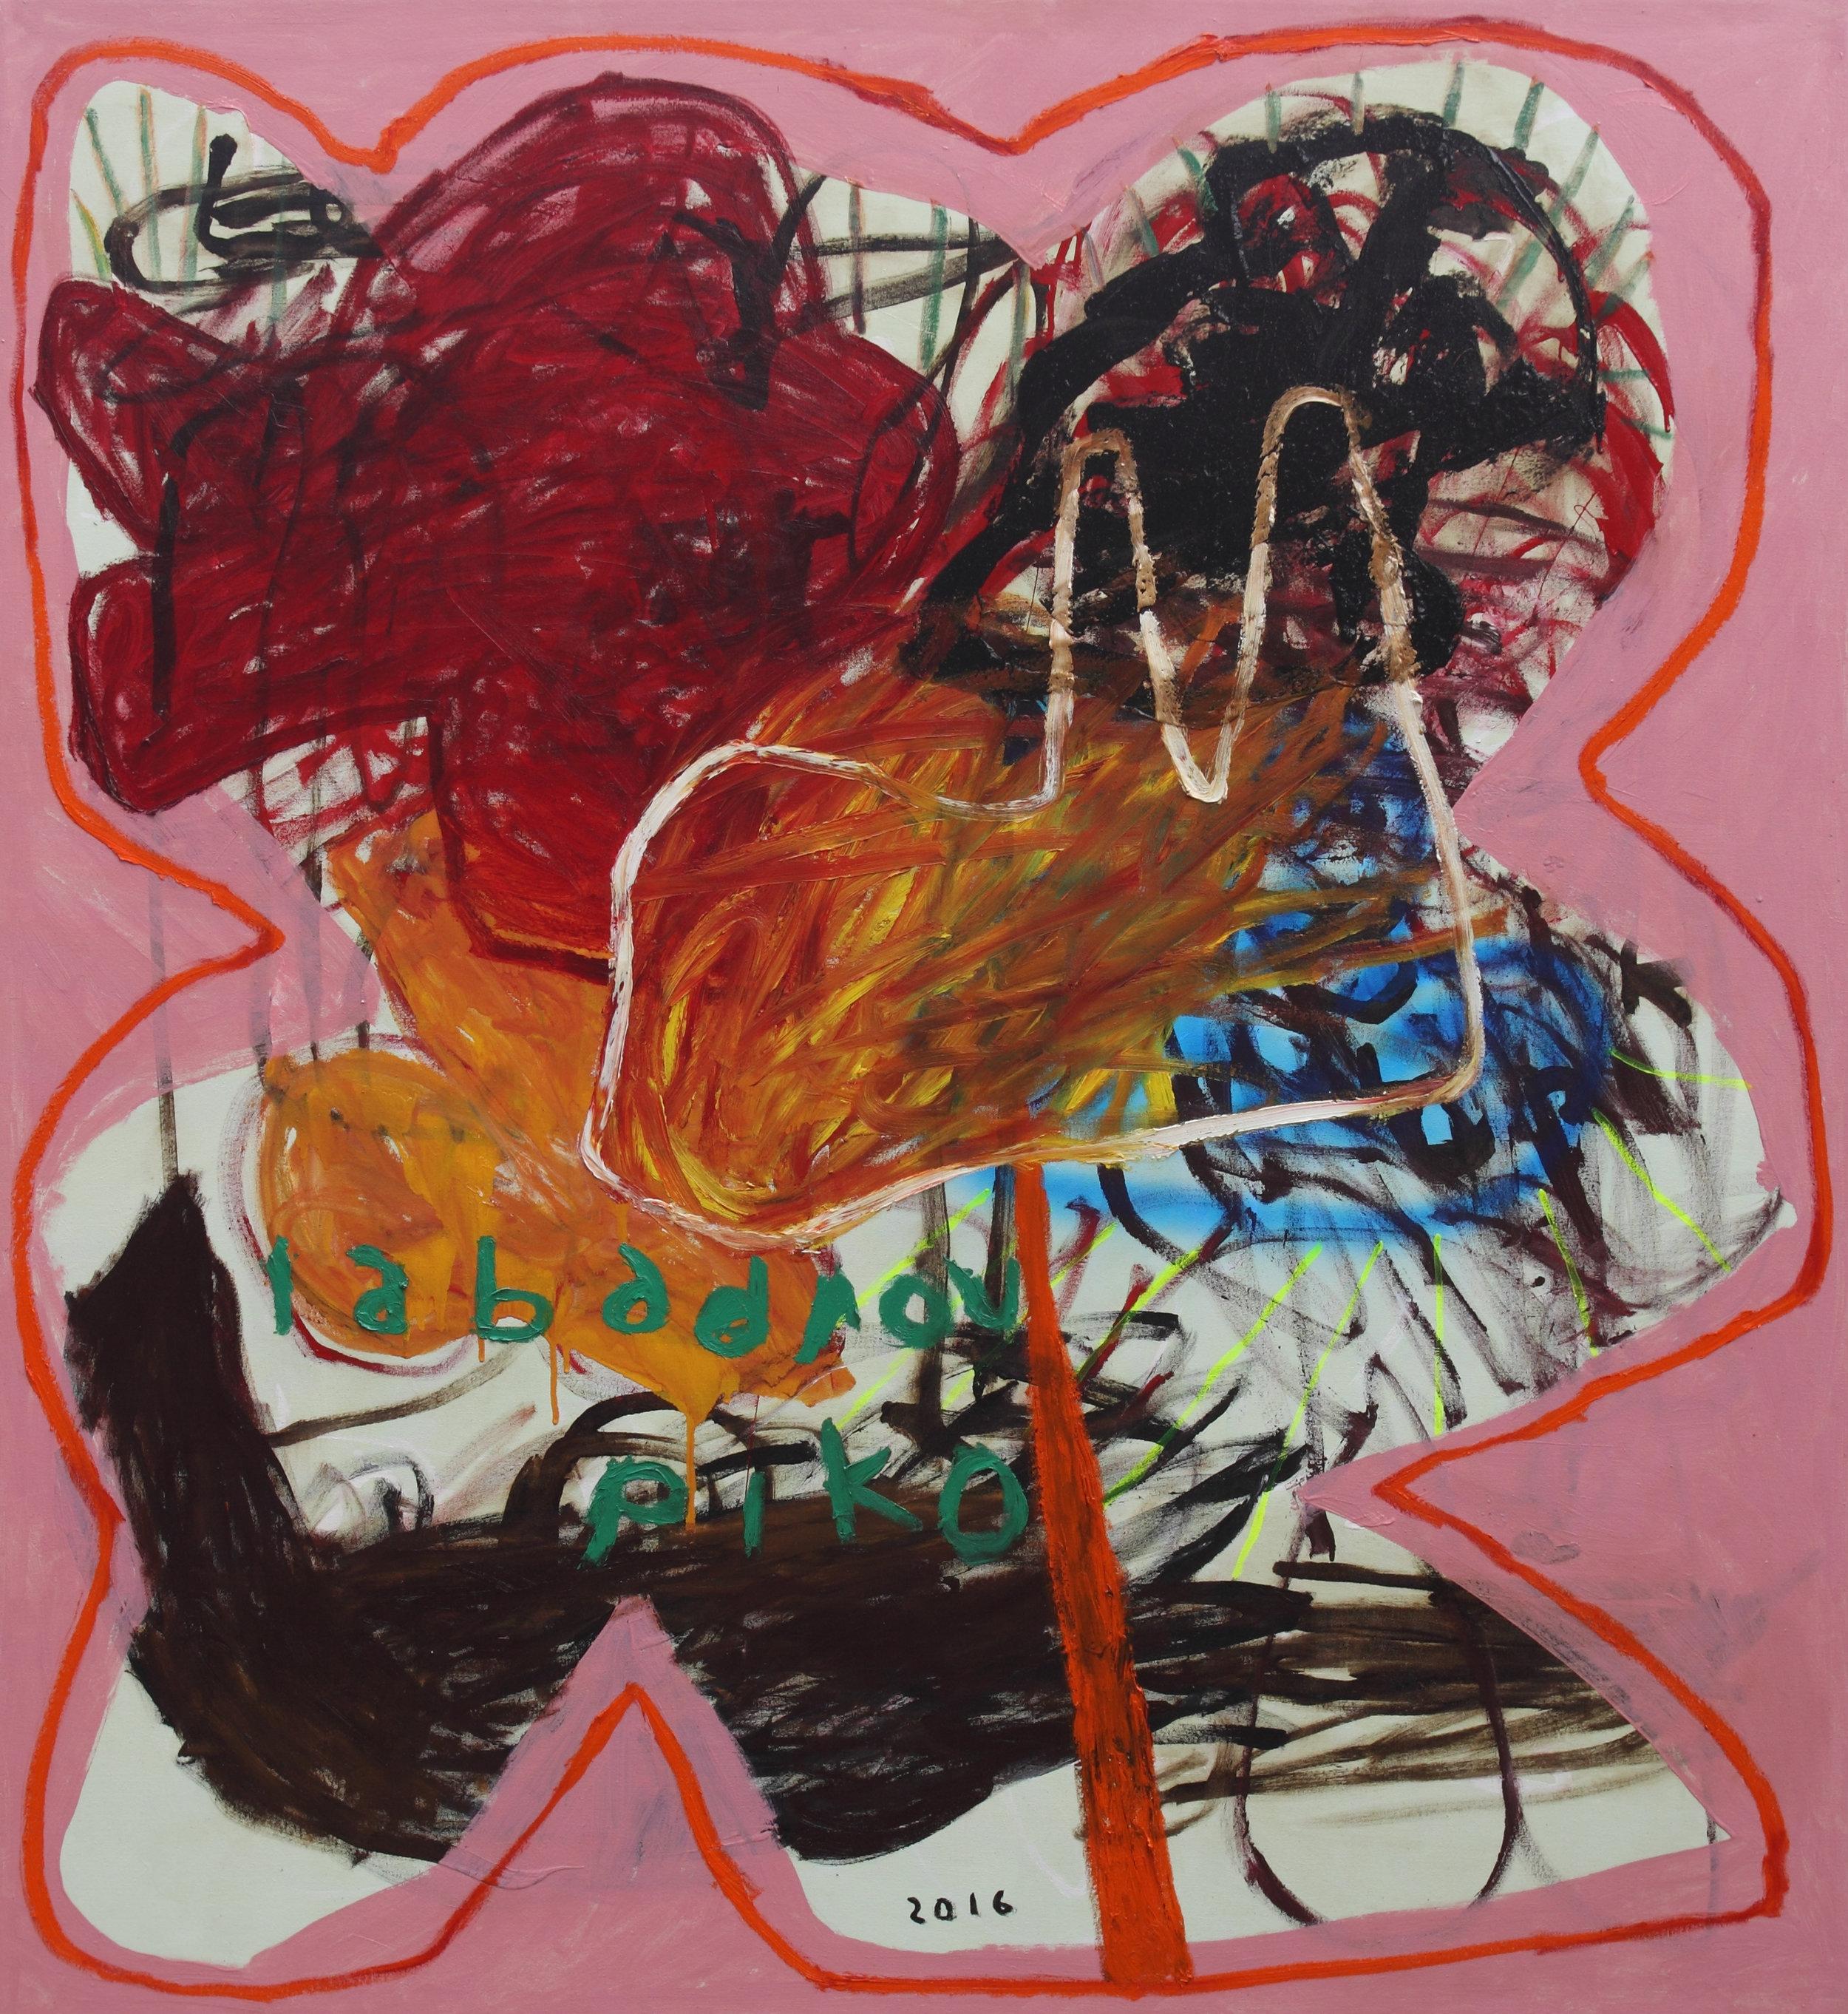 PIKO IABADIOU   Bunga Sunyi,  2016 acrylic bitumen oil alkyd aerosol spray paint on canvas 160 x 145 cm